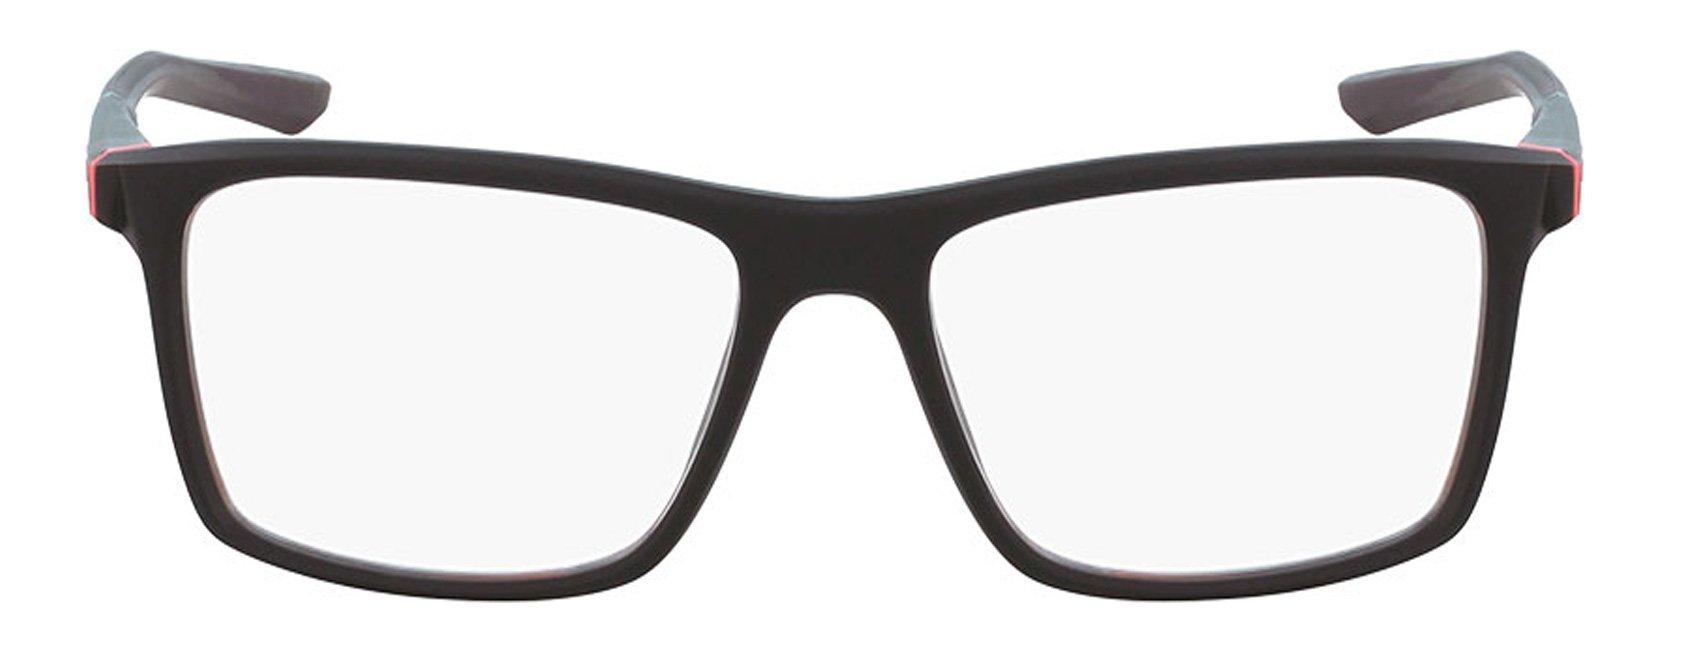 Nike Lead Glasses 7084